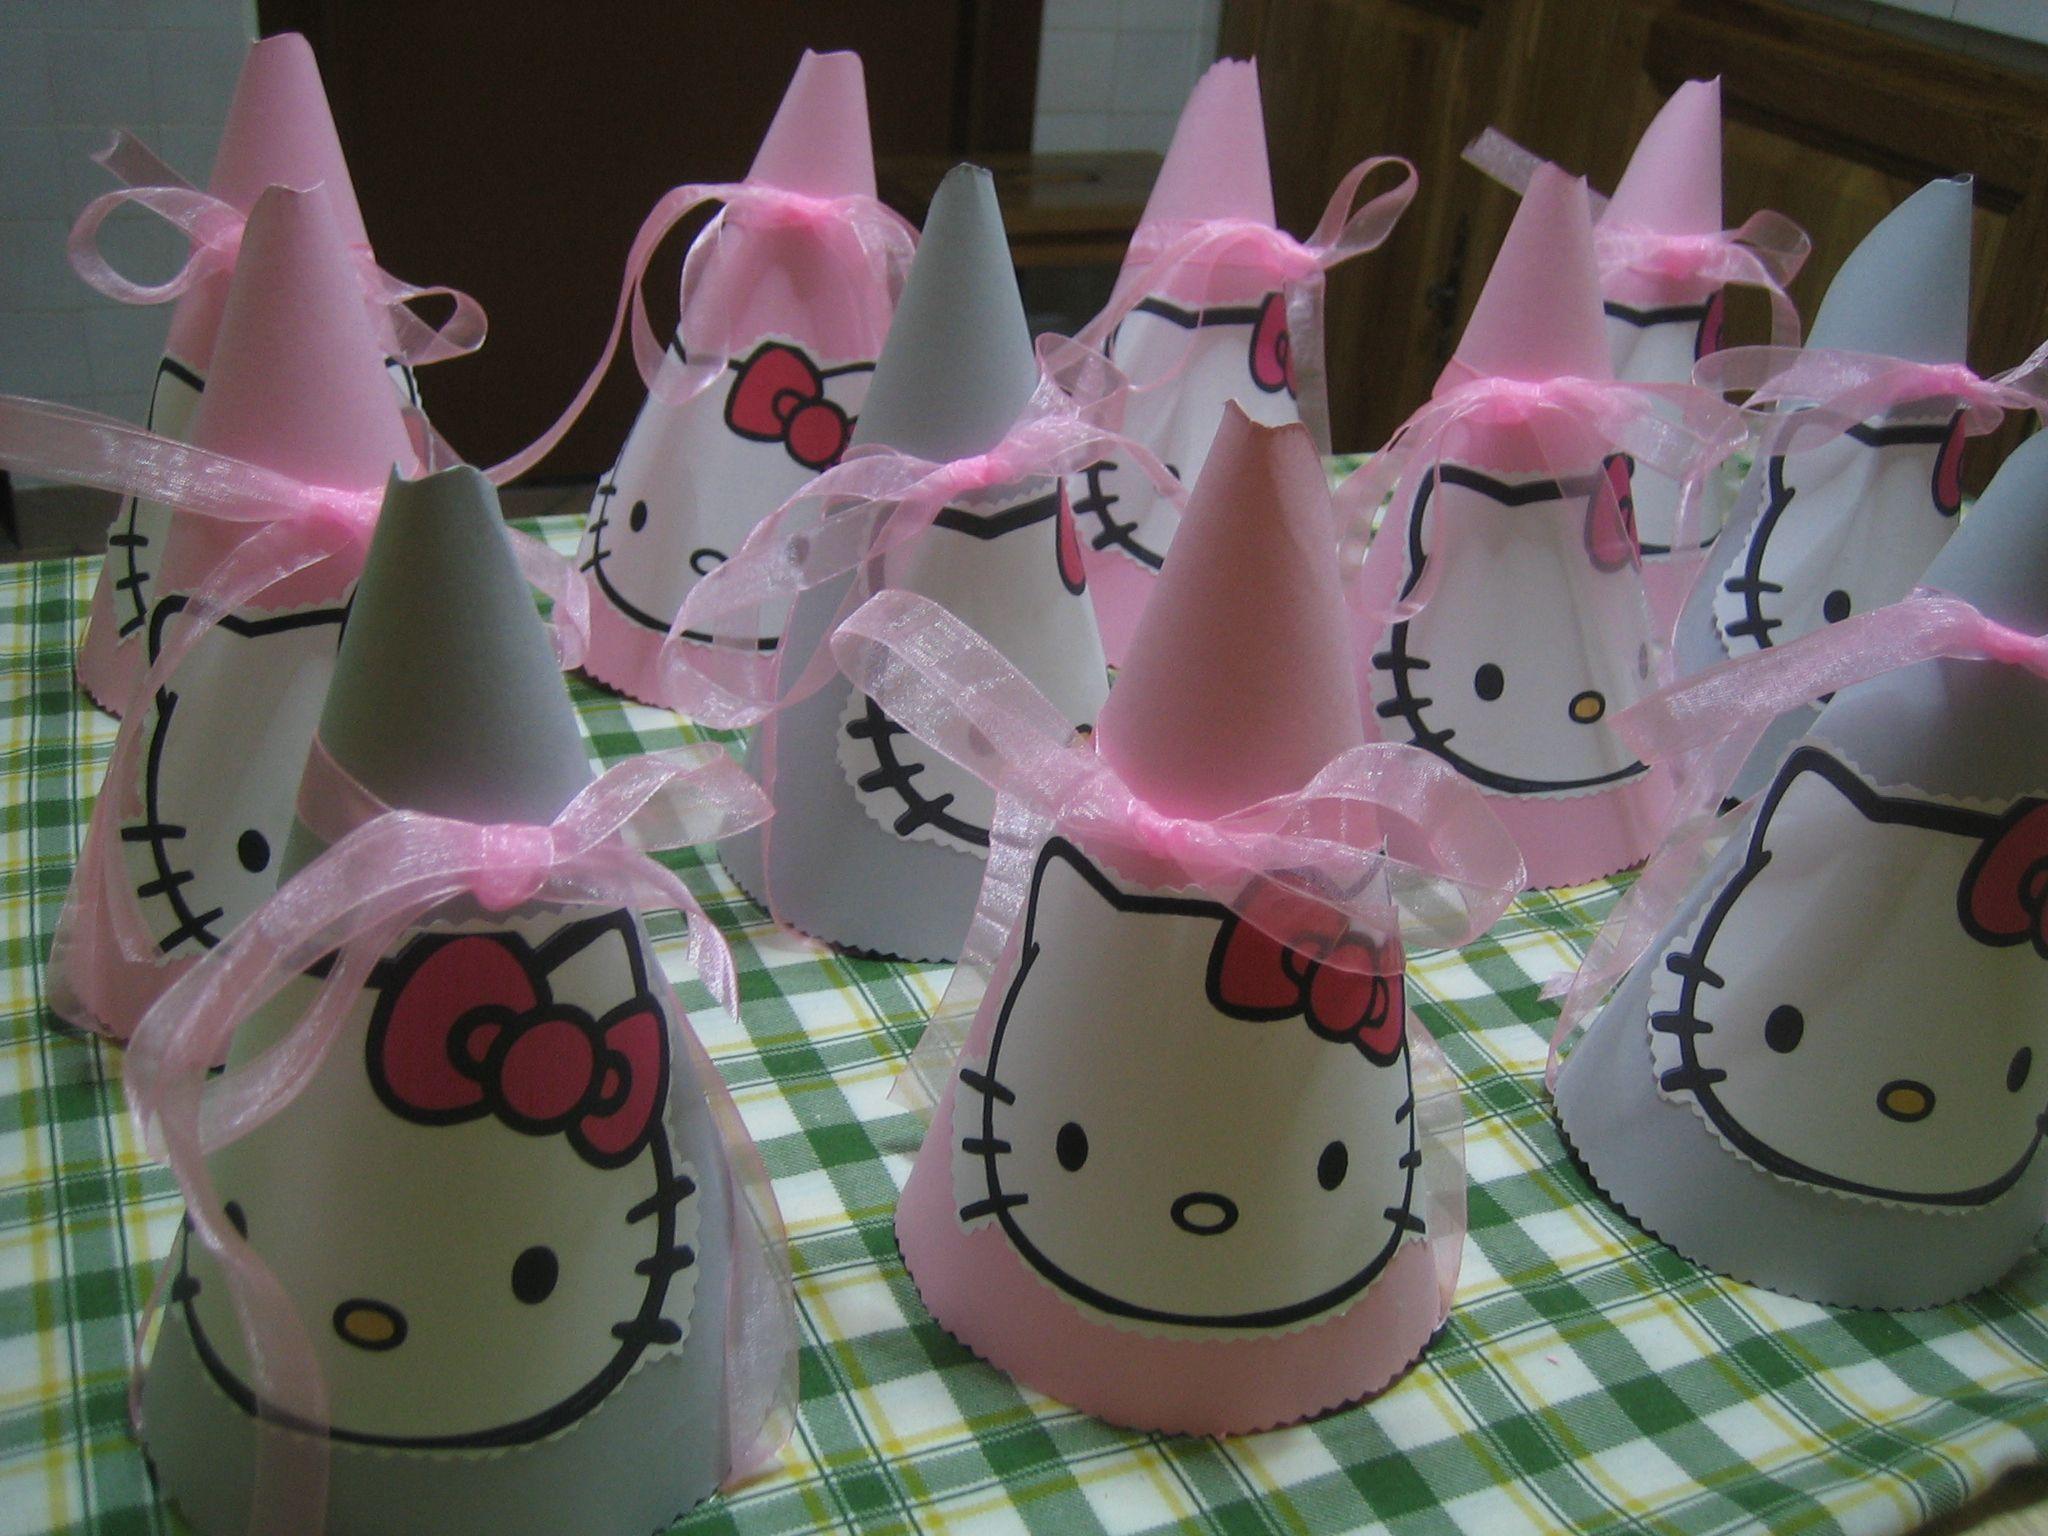 Diy Hello Kitty Party Hats My Diy Pinterest Kitty Party Hello Kitty And Kitty